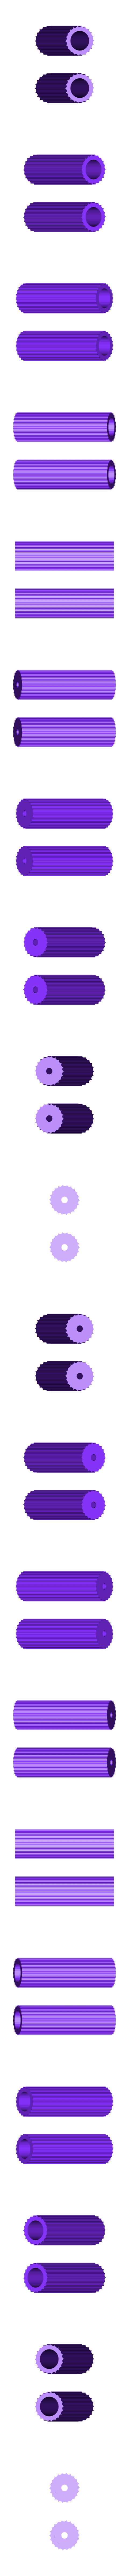 Grips.stl Download free STL file Crazy Simple Camera / Phone Stabilizer • 3D printer design, Absolute3D